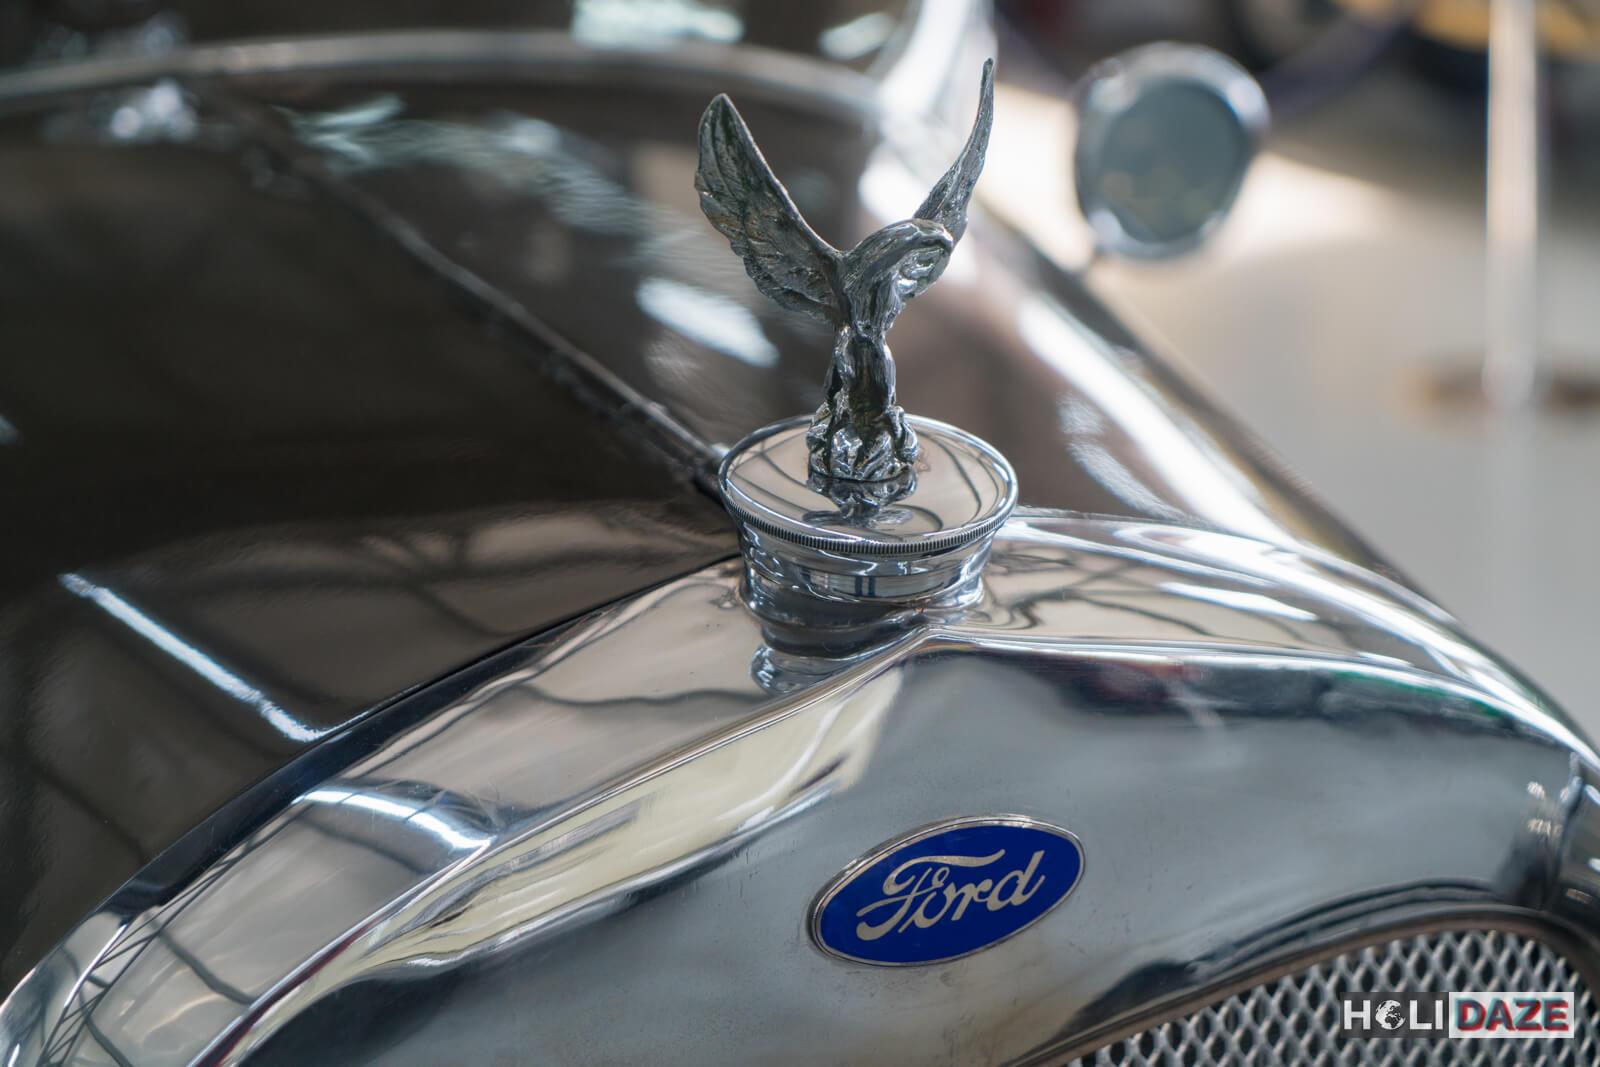 1930 Ford Model A hood ornament